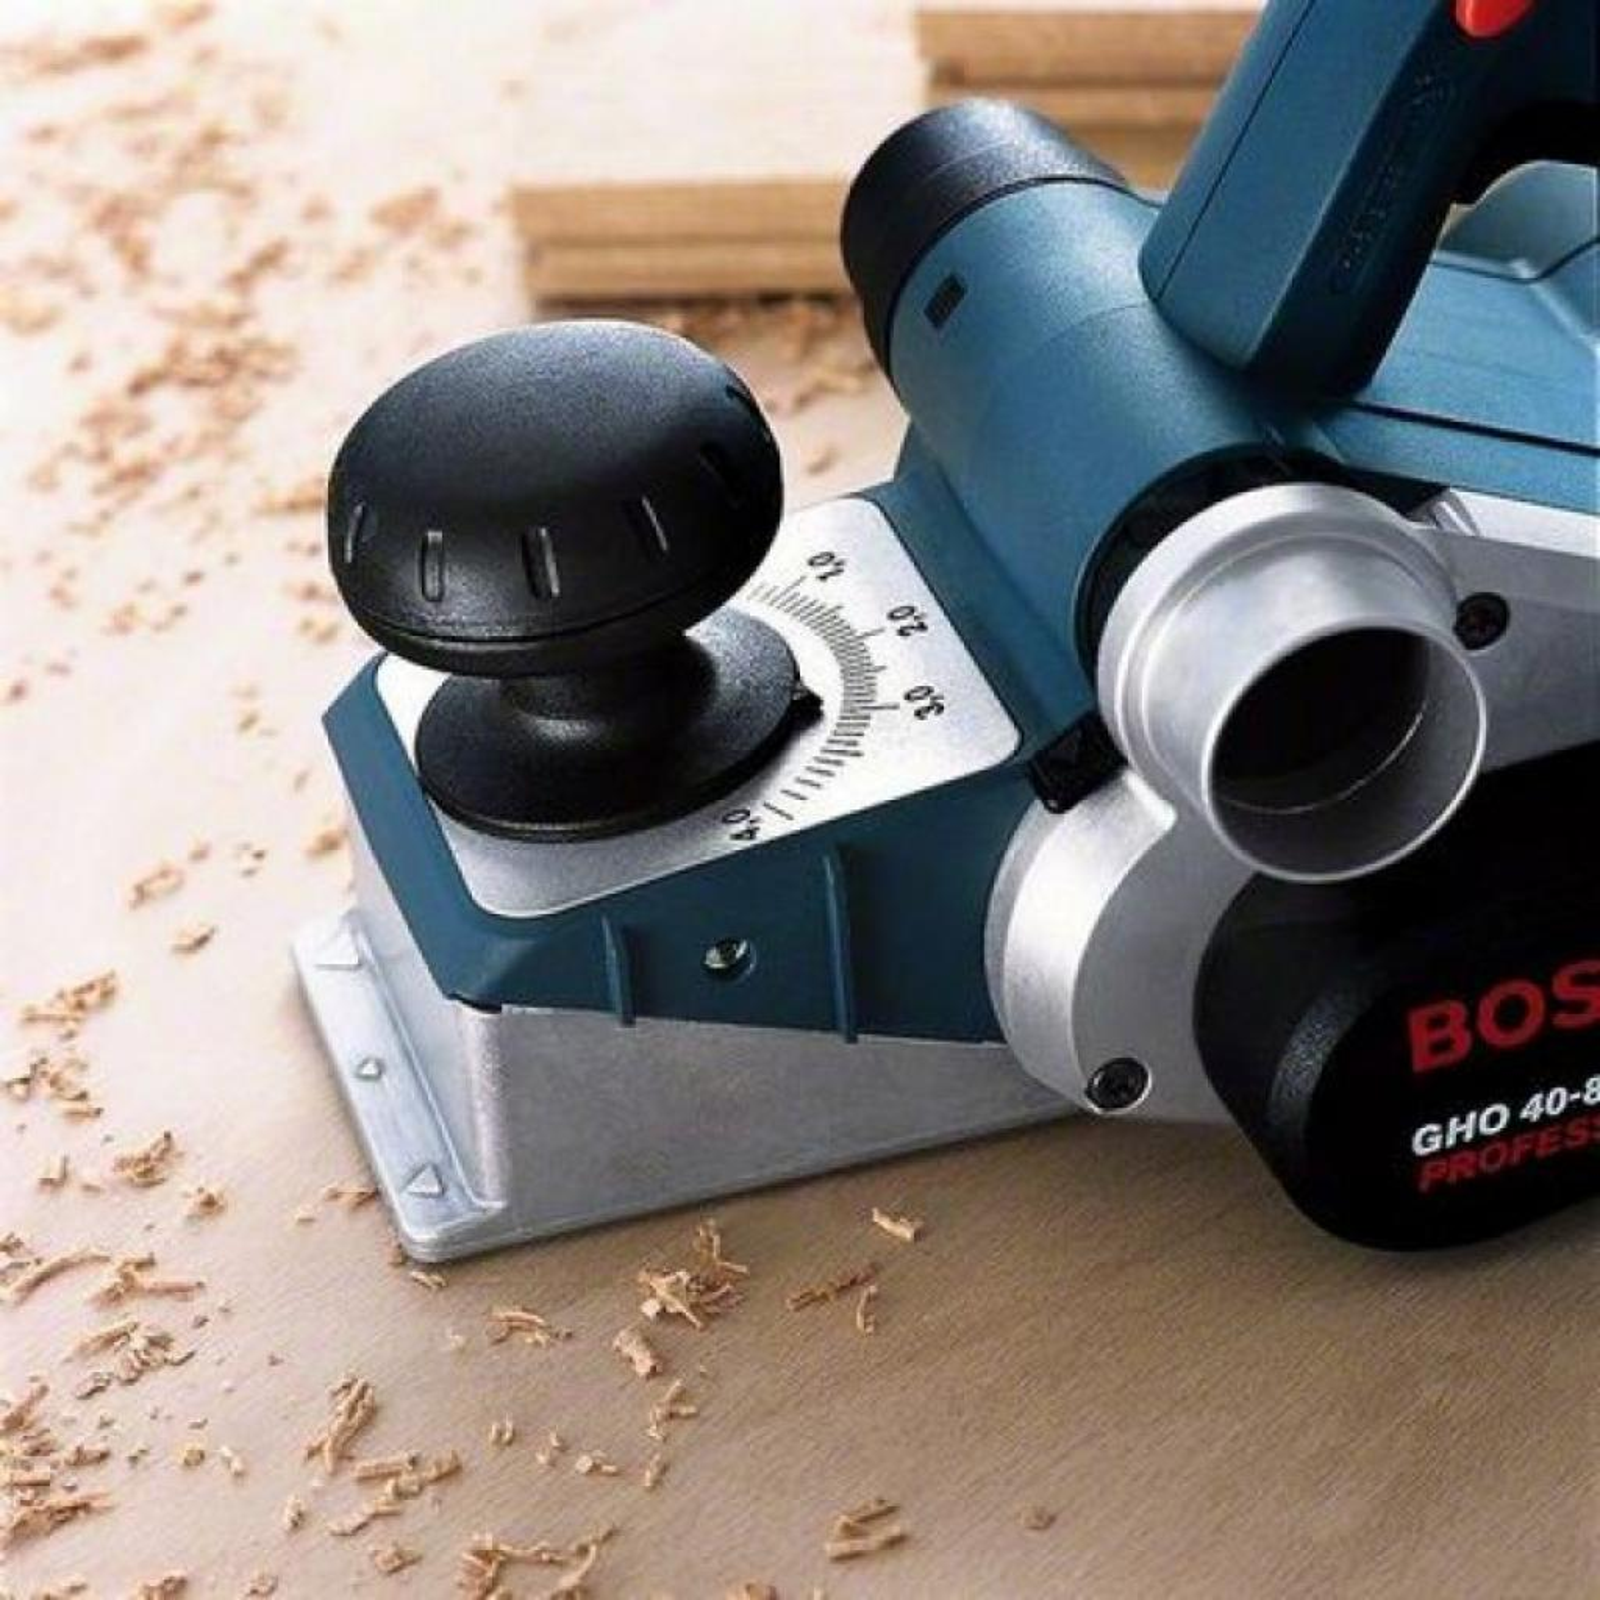 Электрорубанок Bosch GHO 40-82 C Professional (0.601.59A.760) изображение 11